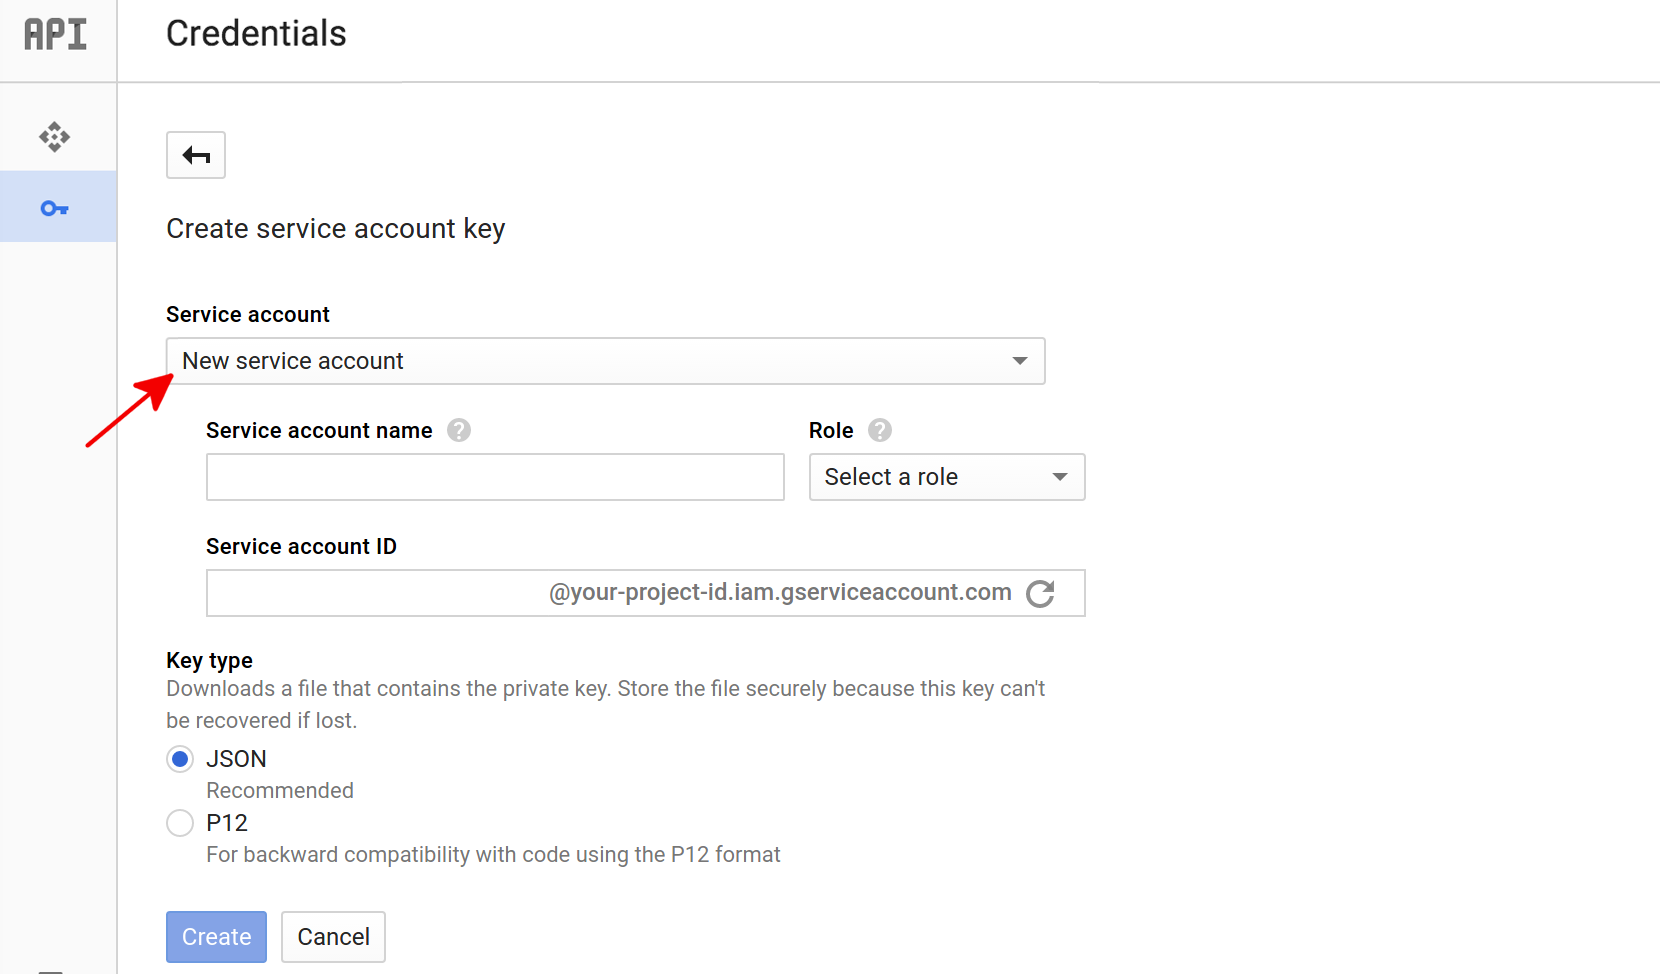 Build RESTful APIs with ASP.NET Web API